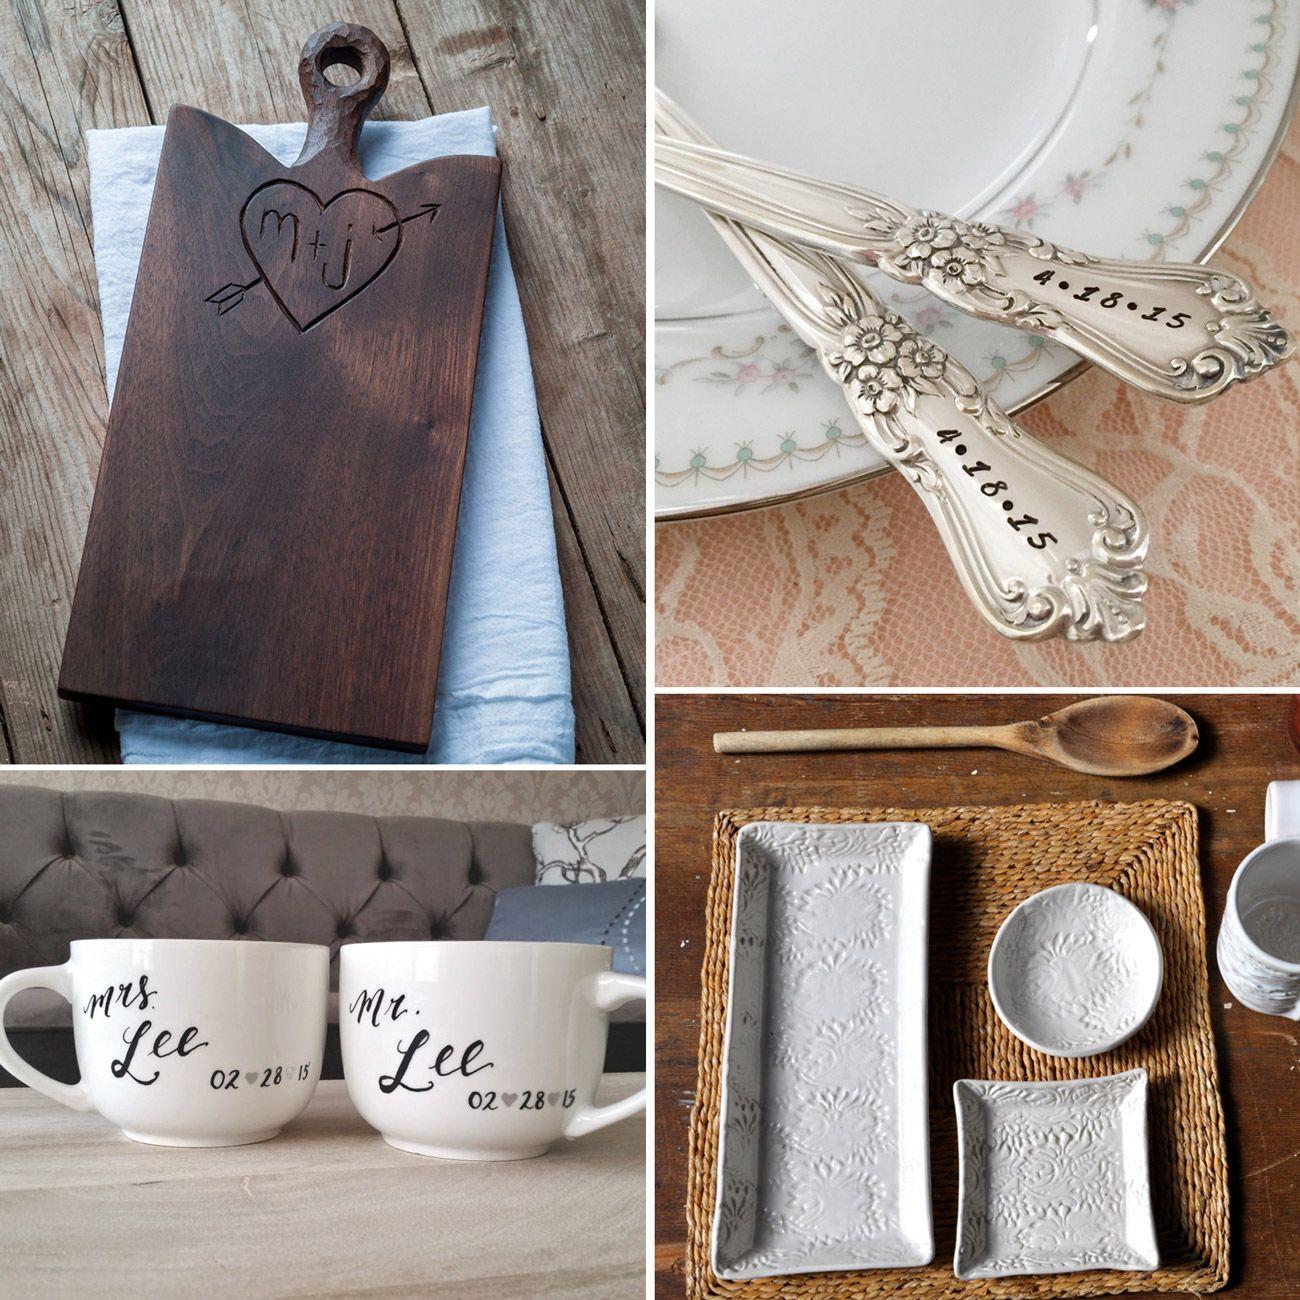 Wedding GIft Ideas from Etsy Canada Etsy wedding, Gift